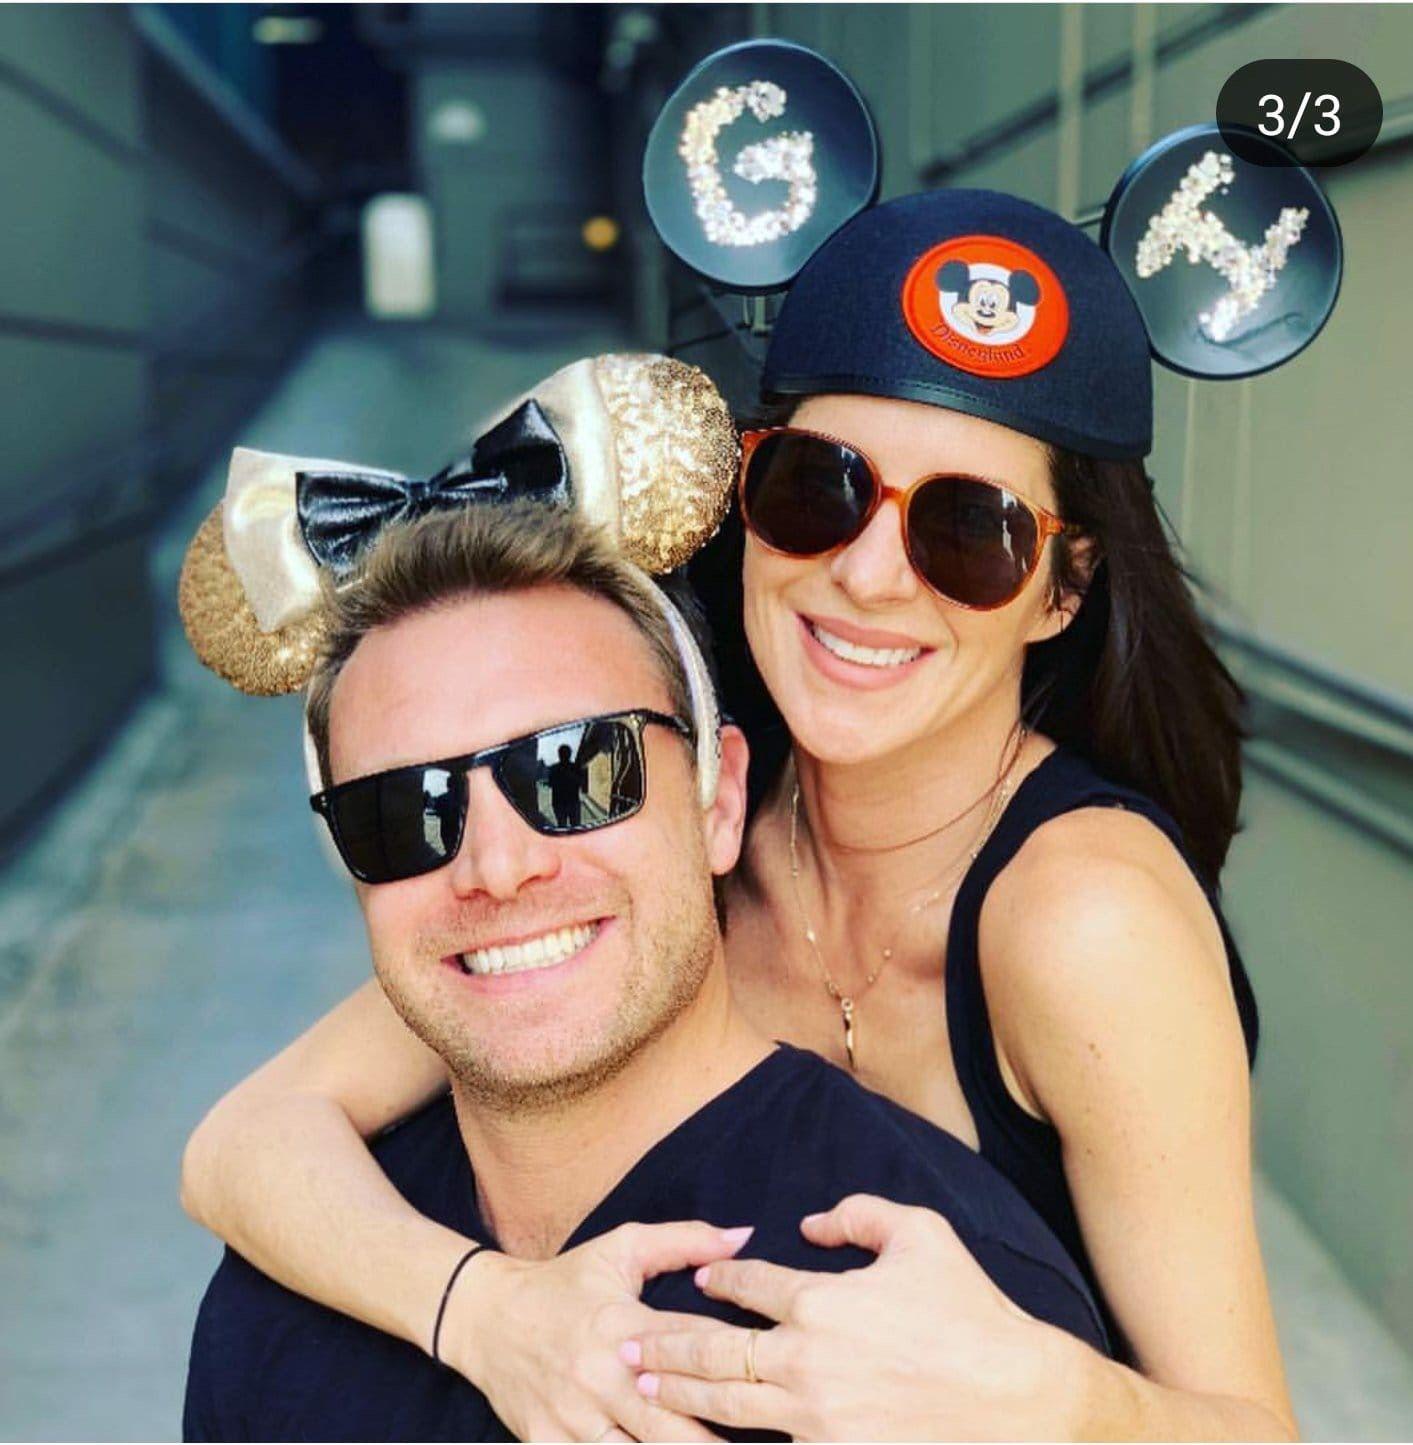 free malta dating sites